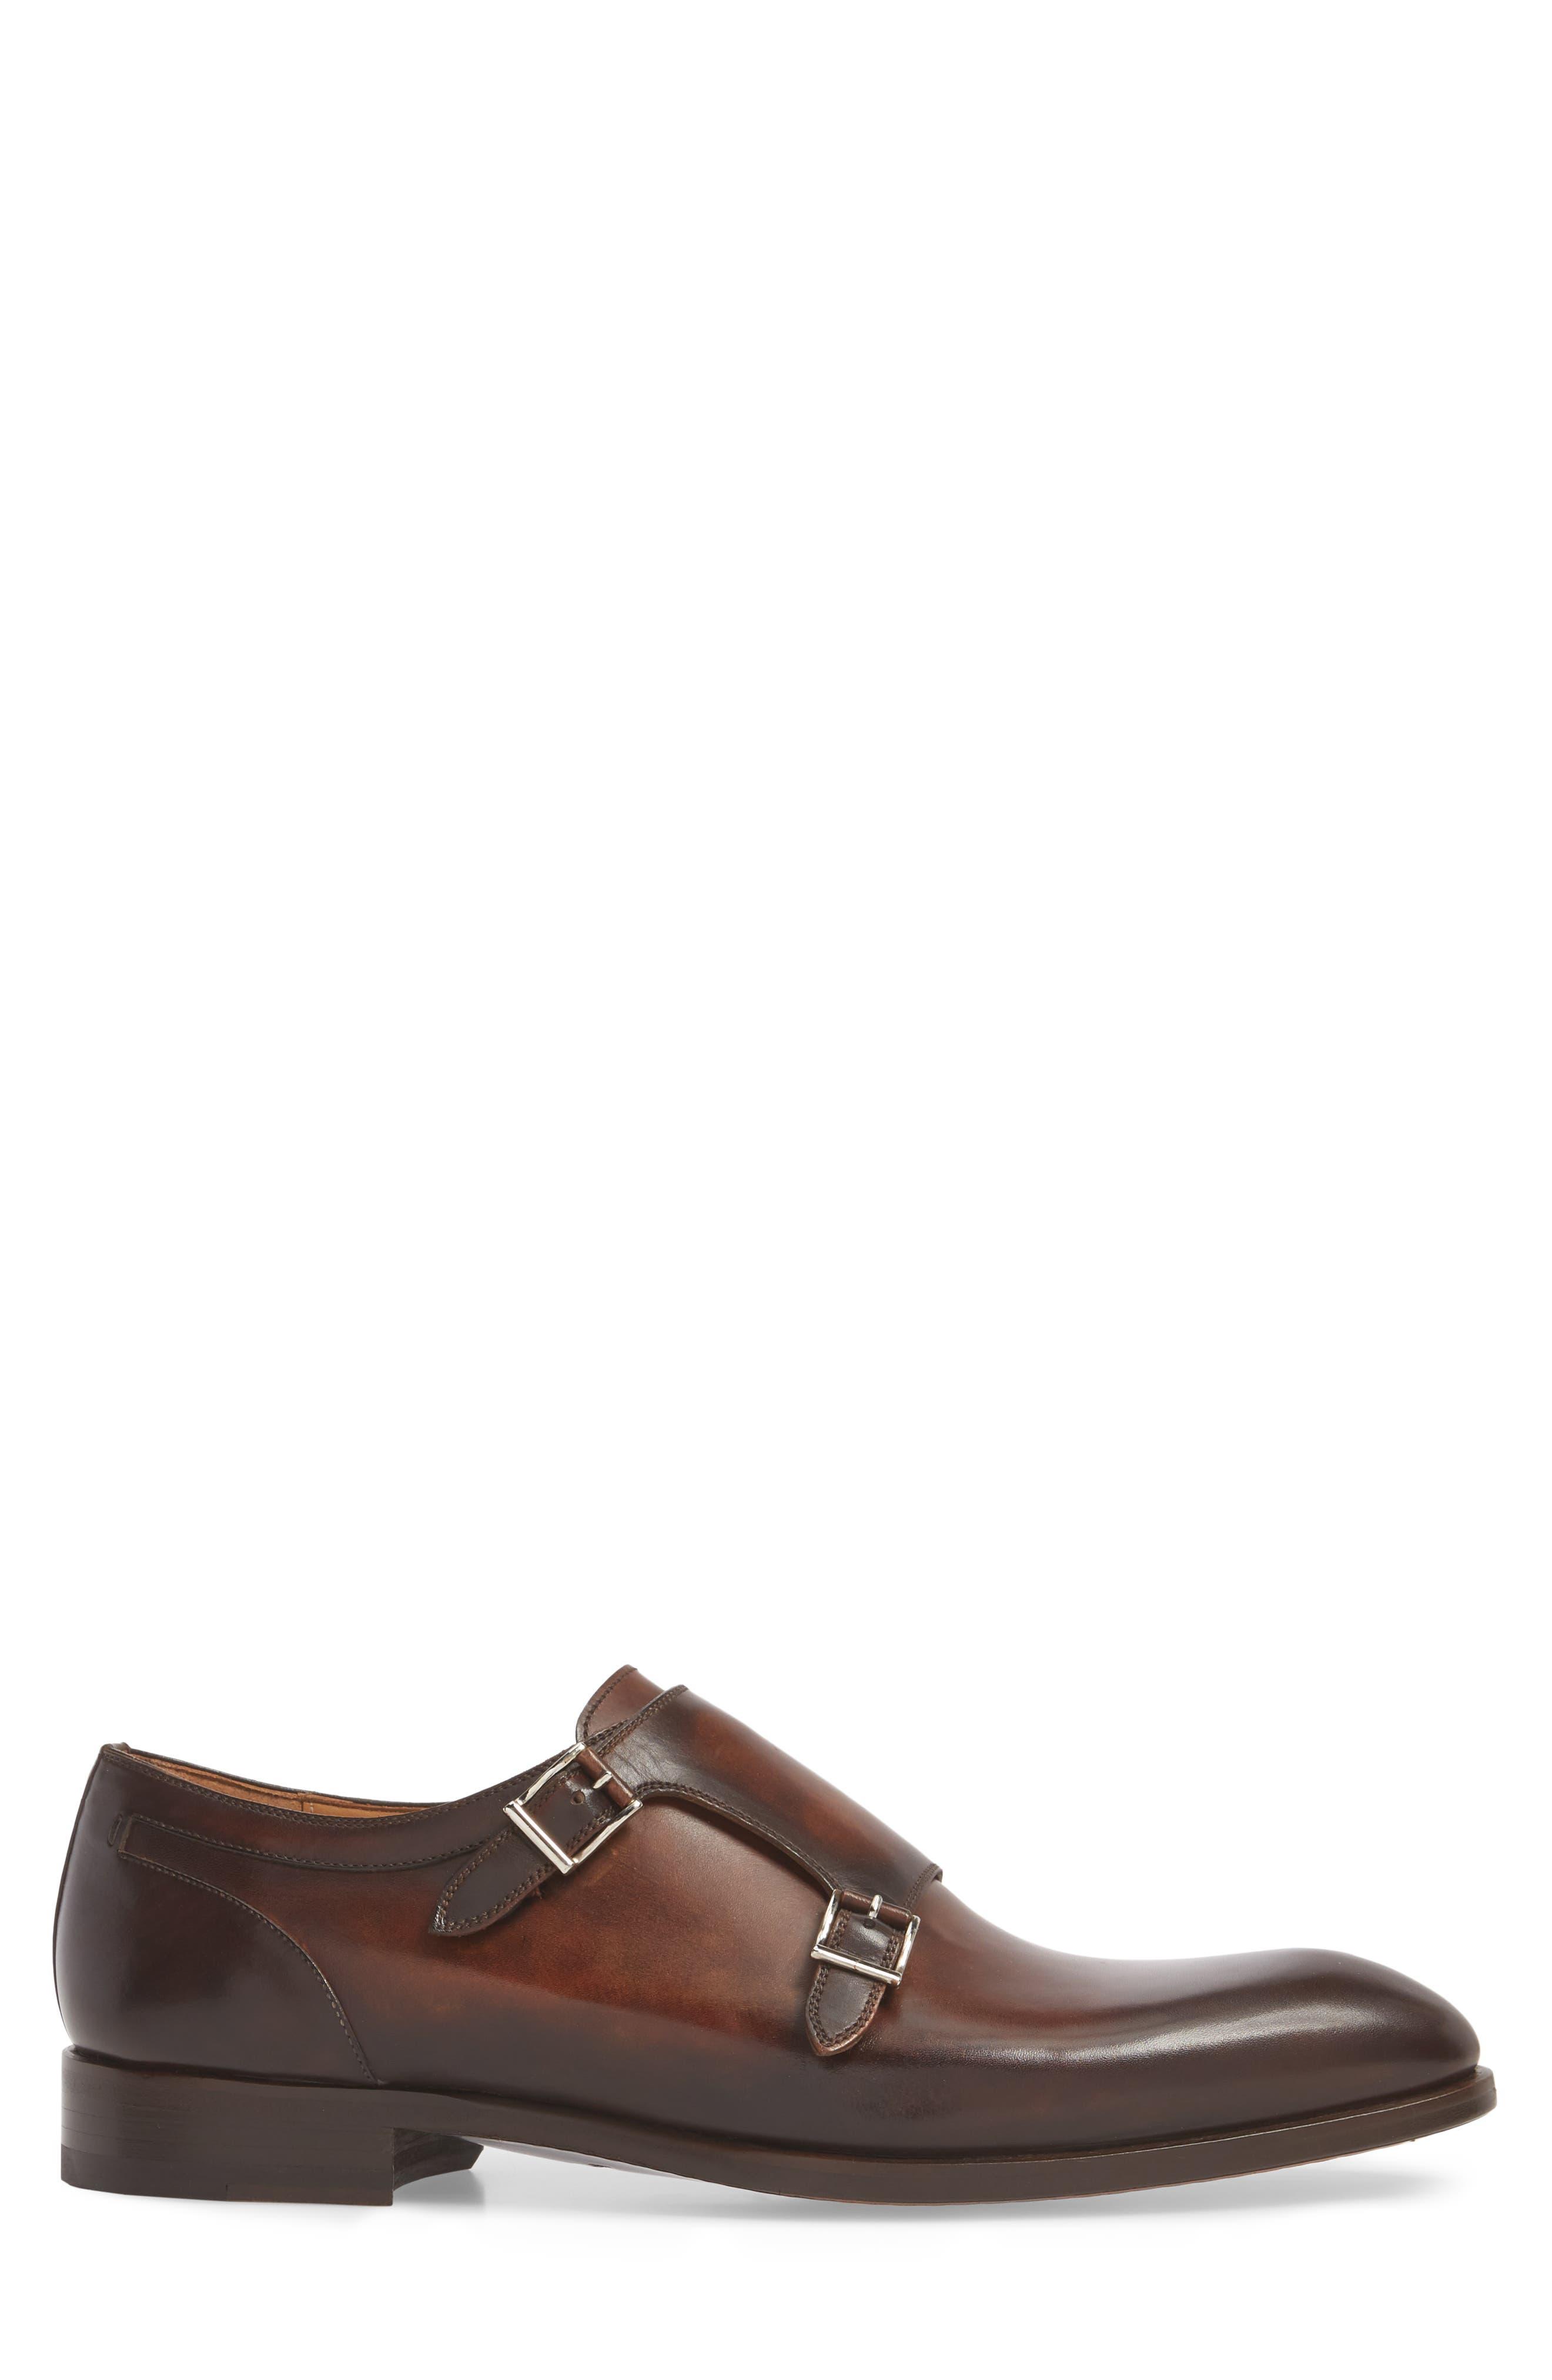 Pratt Double Strap Monk Shoe,                             Alternate thumbnail 3, color,